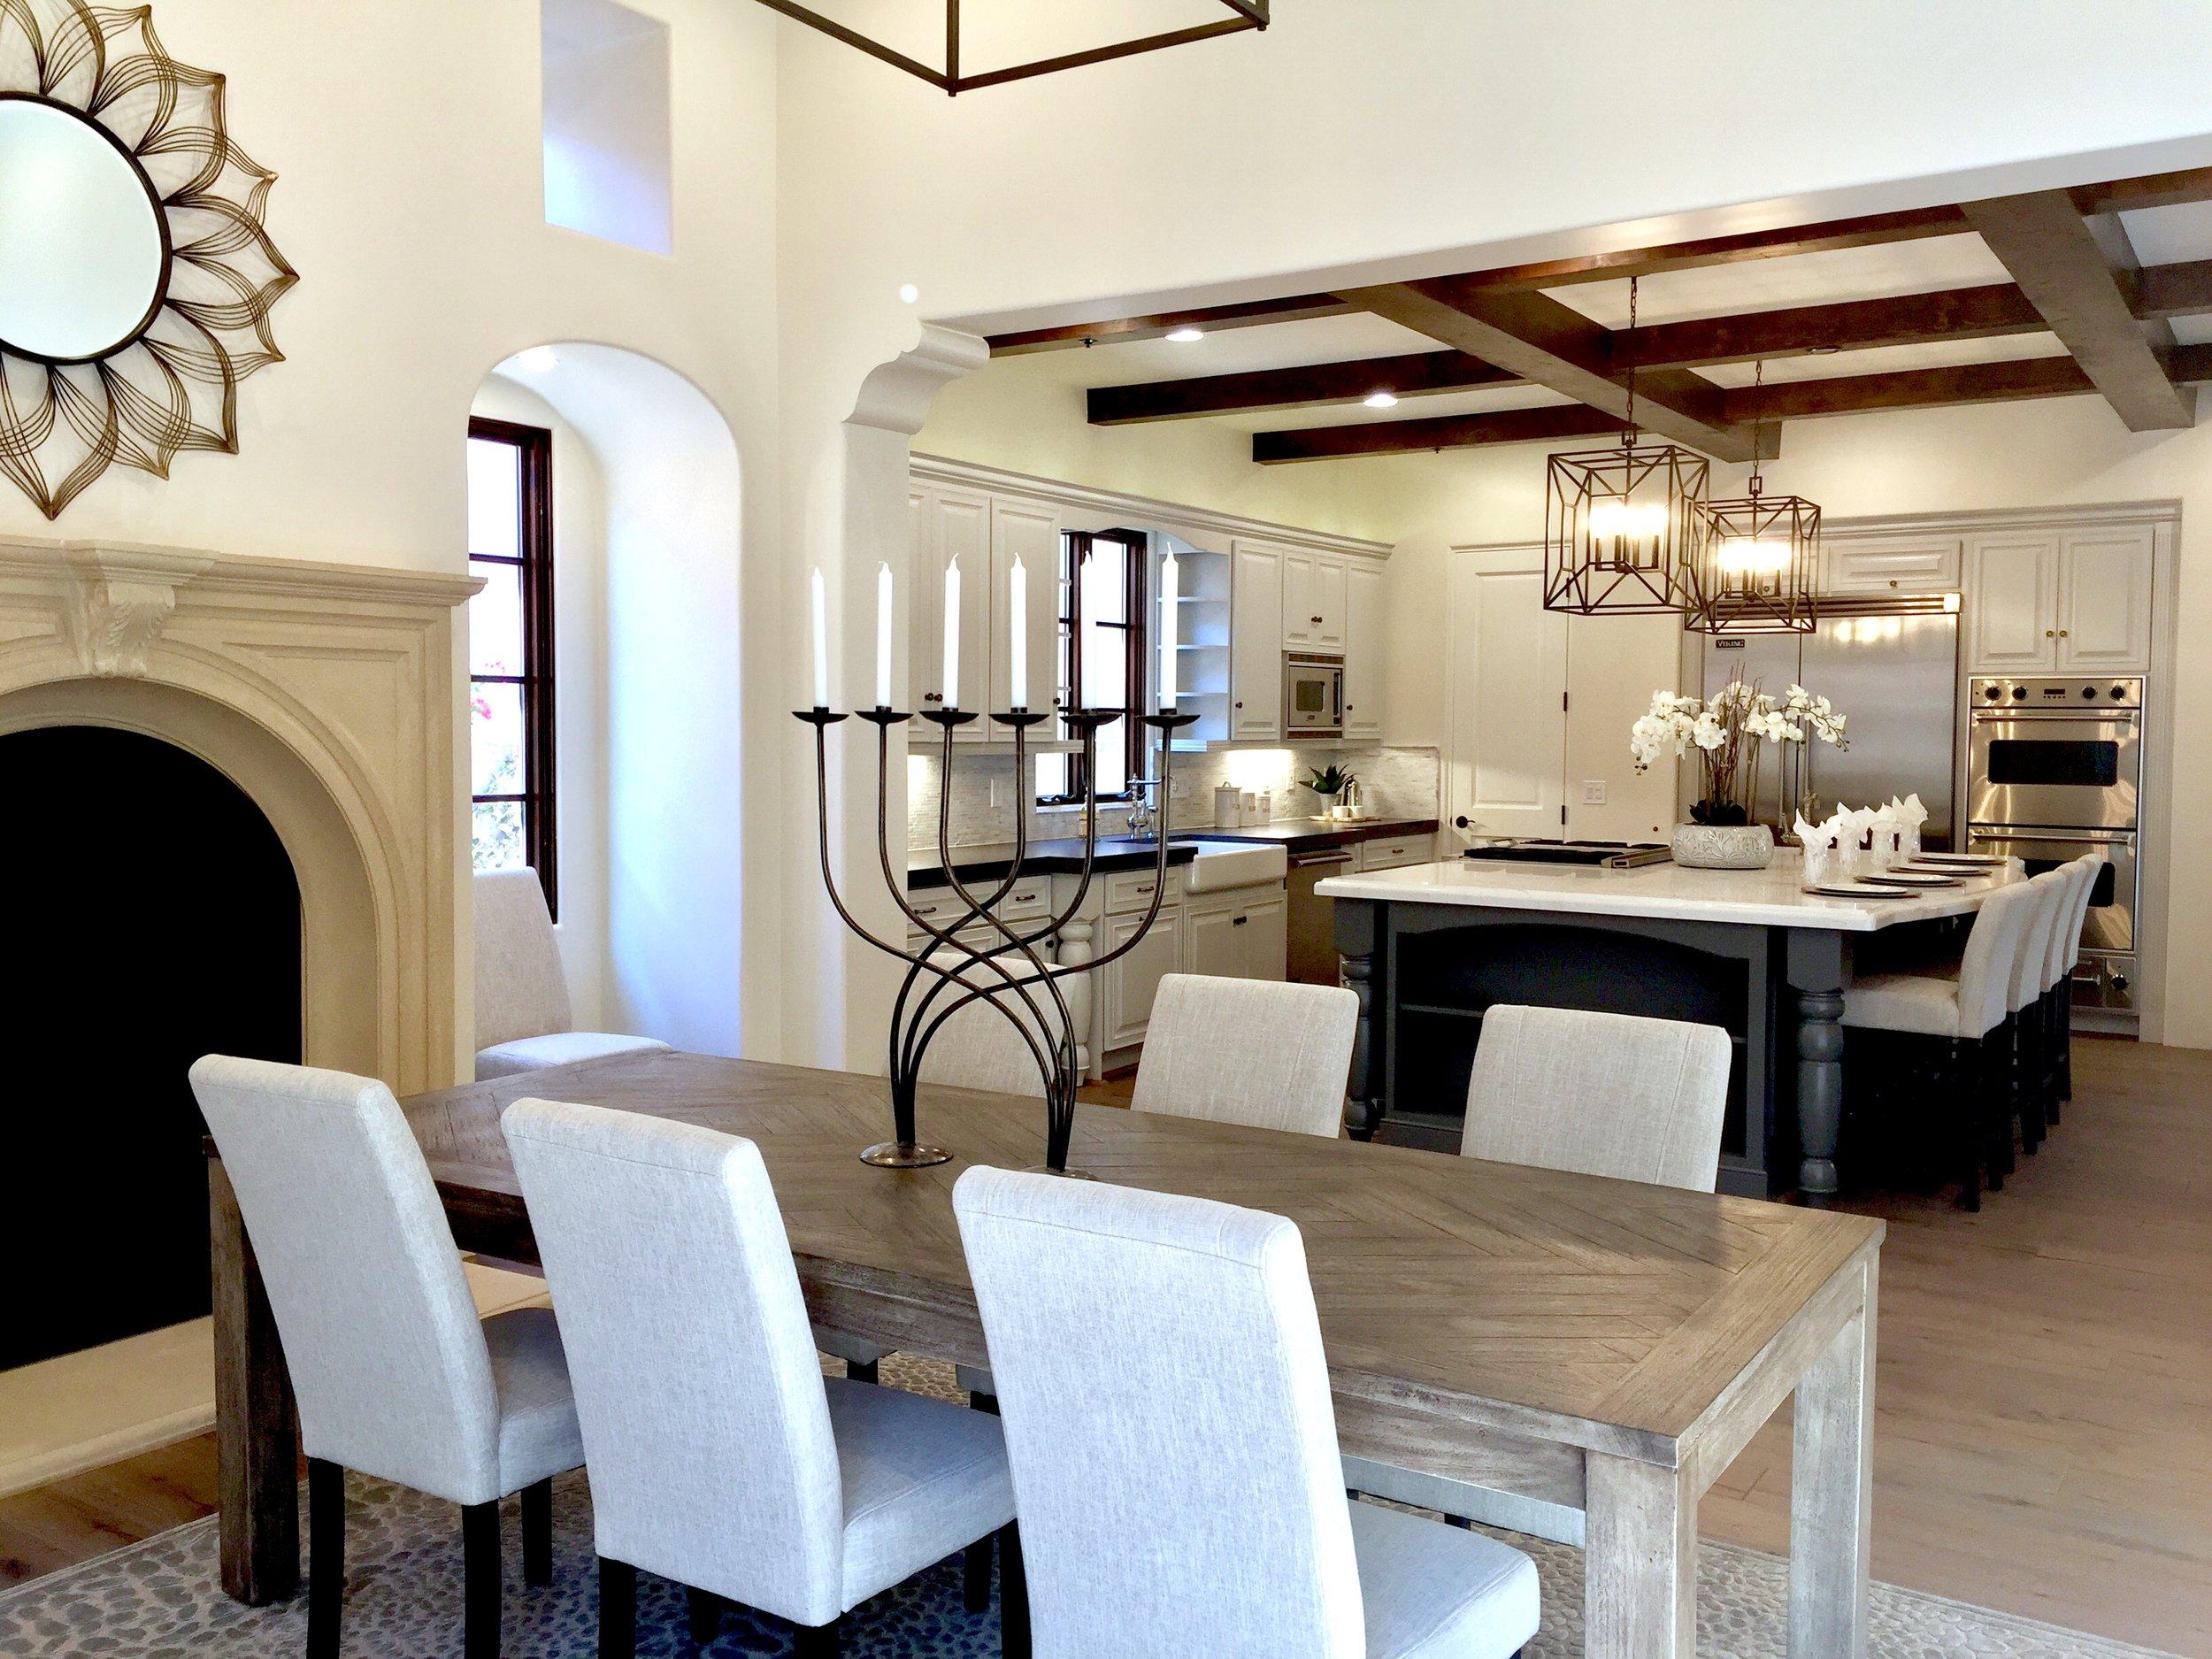 Staged Home Tour: $2.2 Million Tuscan Style Luxury Arizona Home 4.jpg